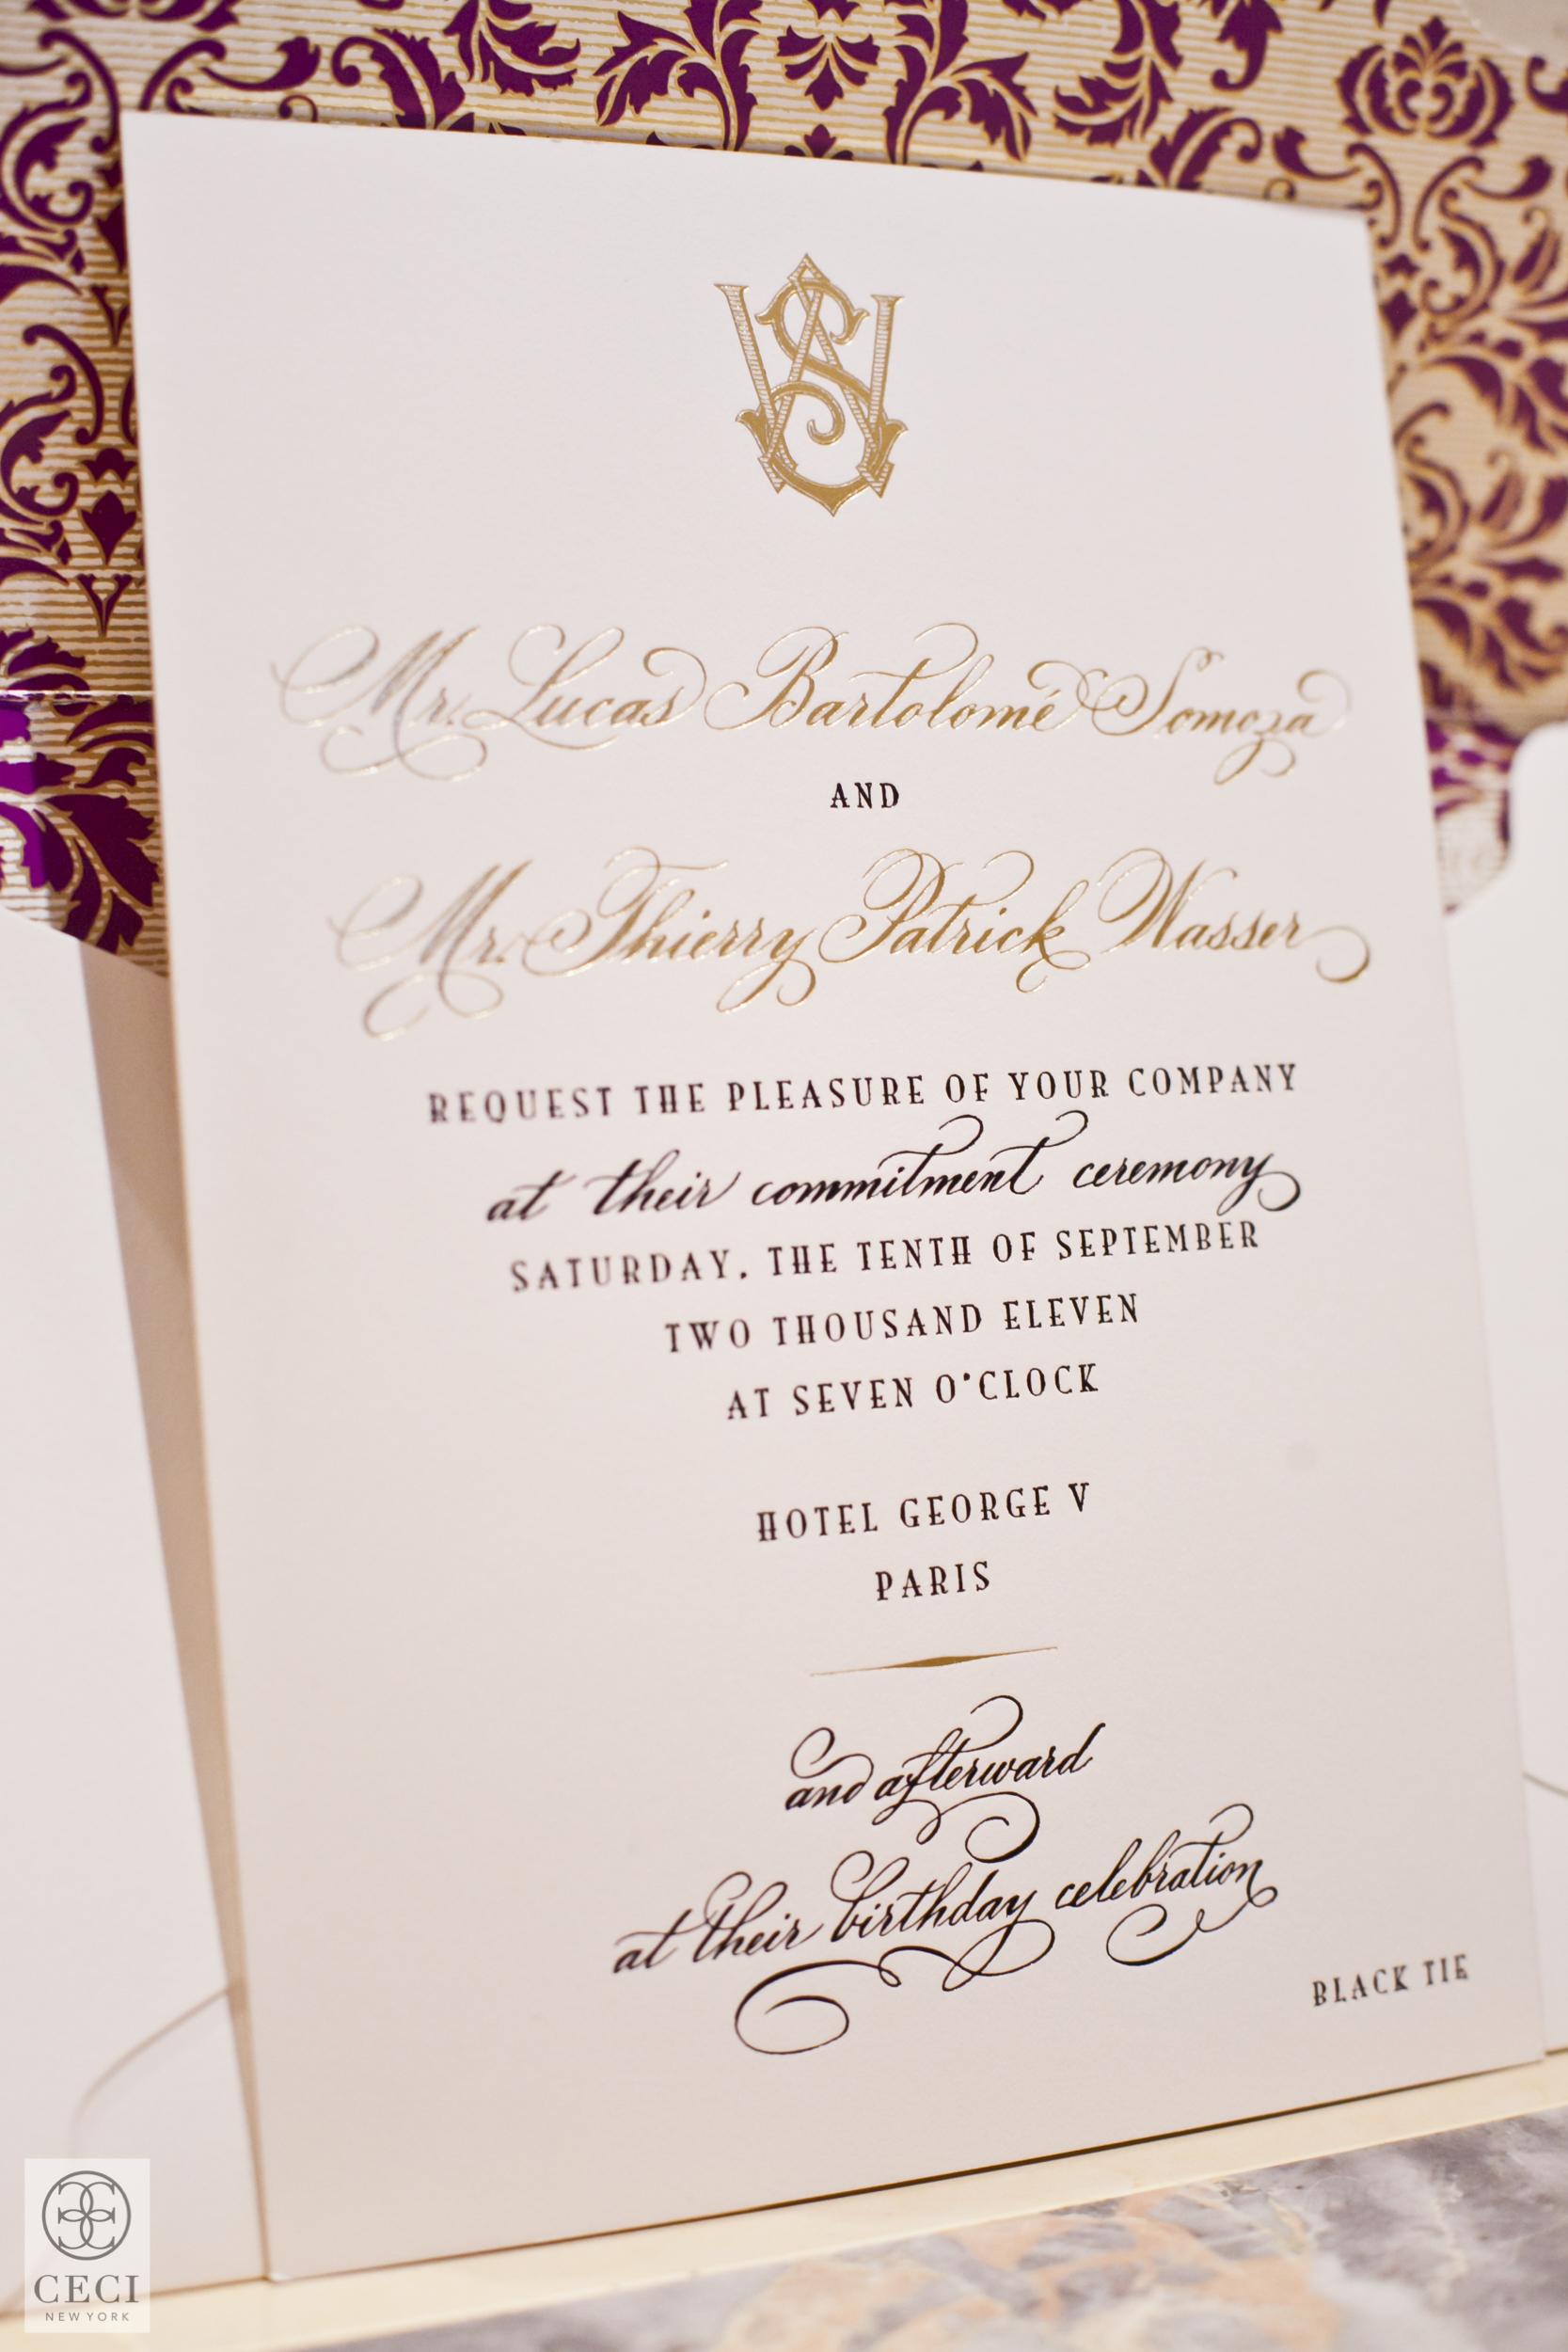 ceci_new_york_lucas_somoza_purple_regal_wediding_birthday_commitment_ceremony_invitation_logo_branding_perfume_gold_-12.jpg